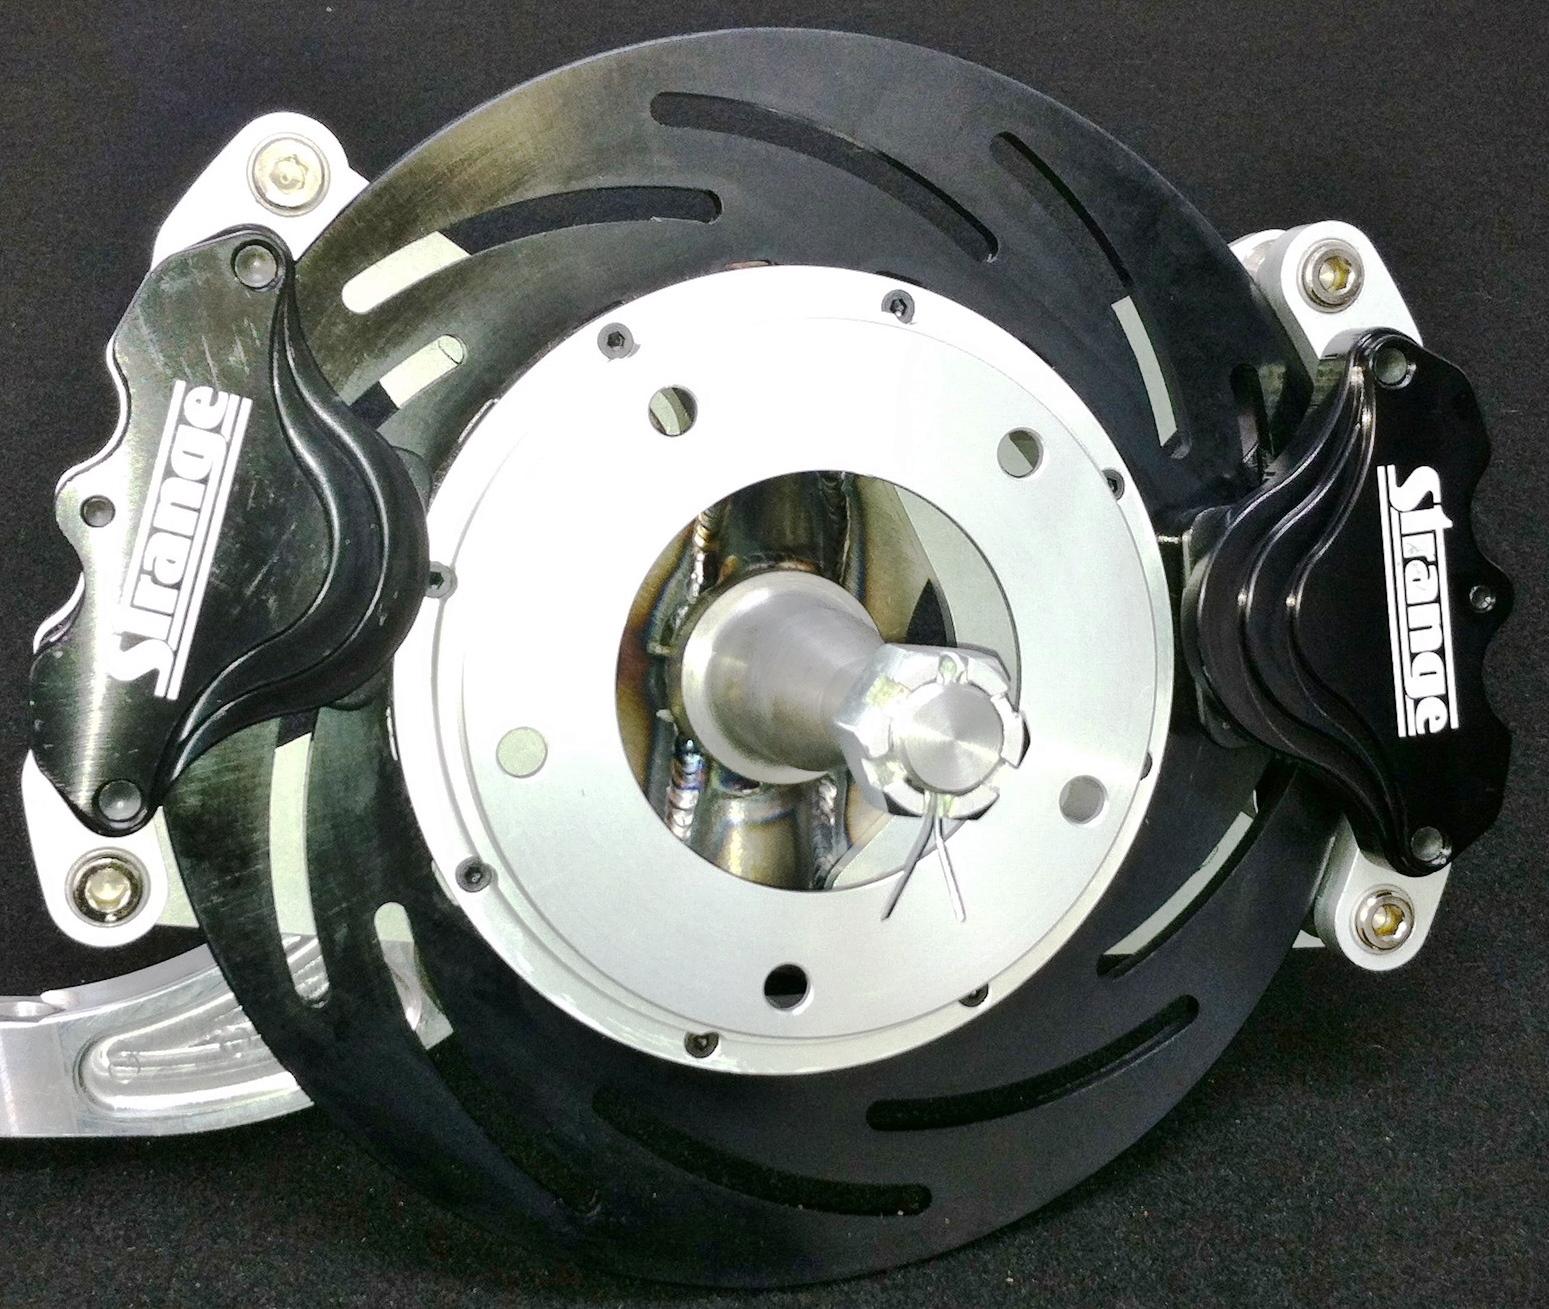 TRZ G-Body Strange Dual Caliper Spindle Mount Brake Kit (Pro Series 2) for  TRZ Spindle / Strange Strut